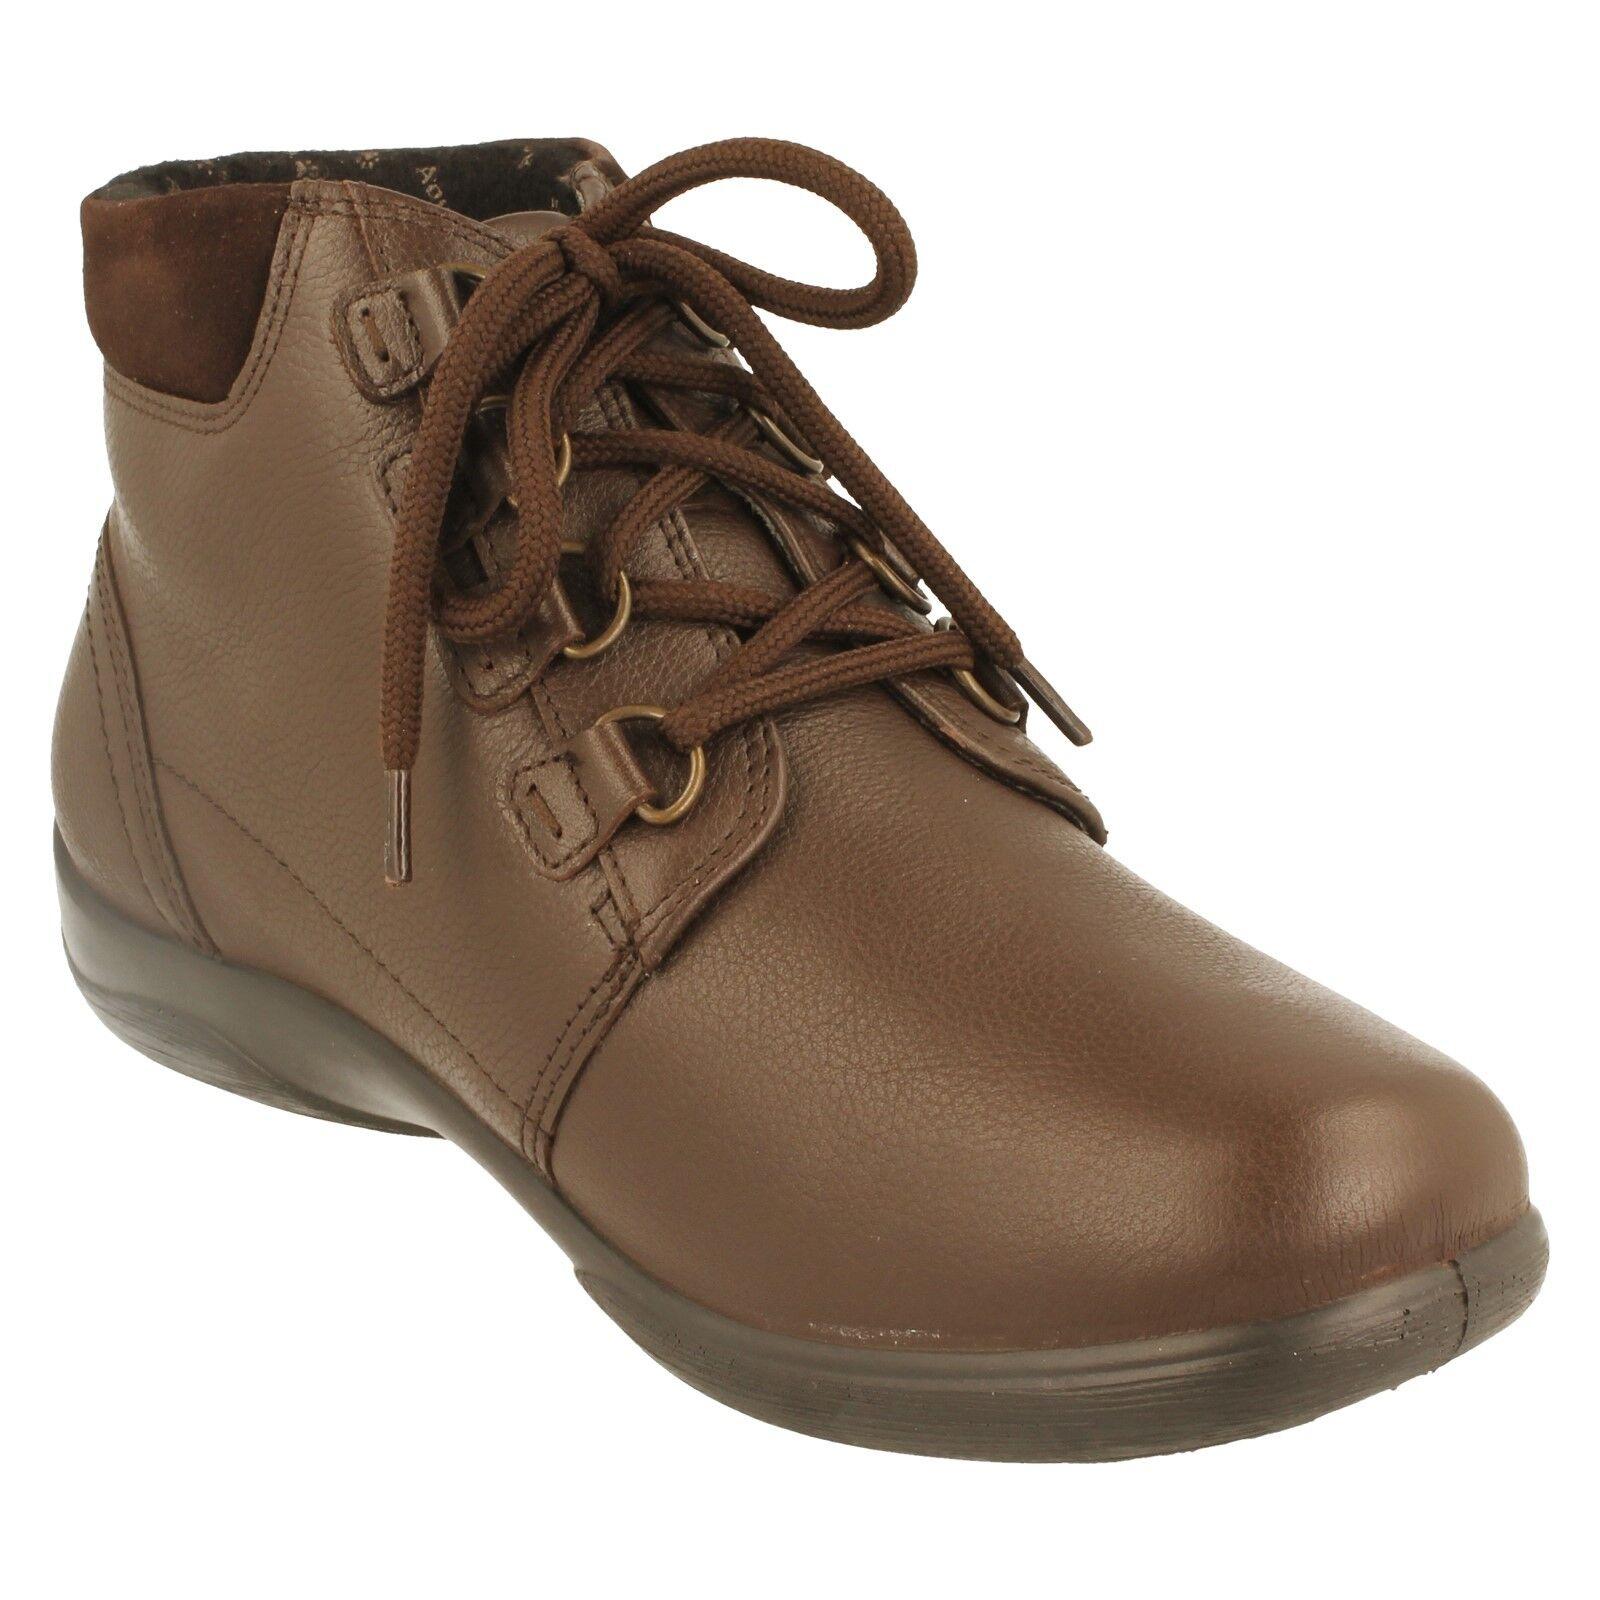 Padders Damas Impermeable botas al al al tobillo-viaje 6a7463